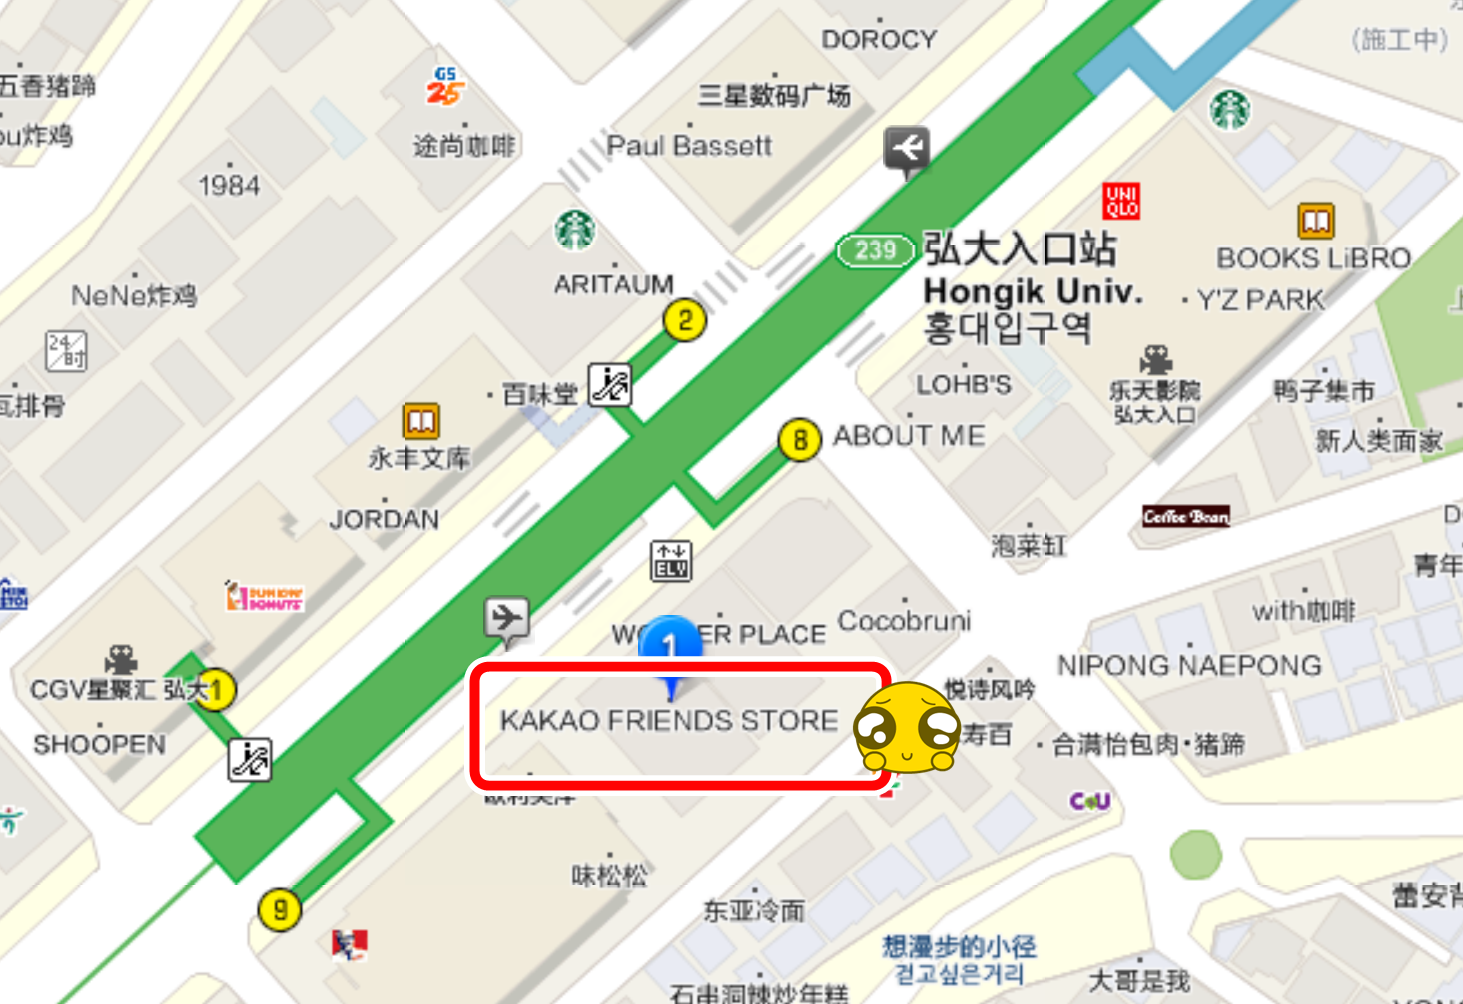 KAKAO FRIENDS STORE 弘大店